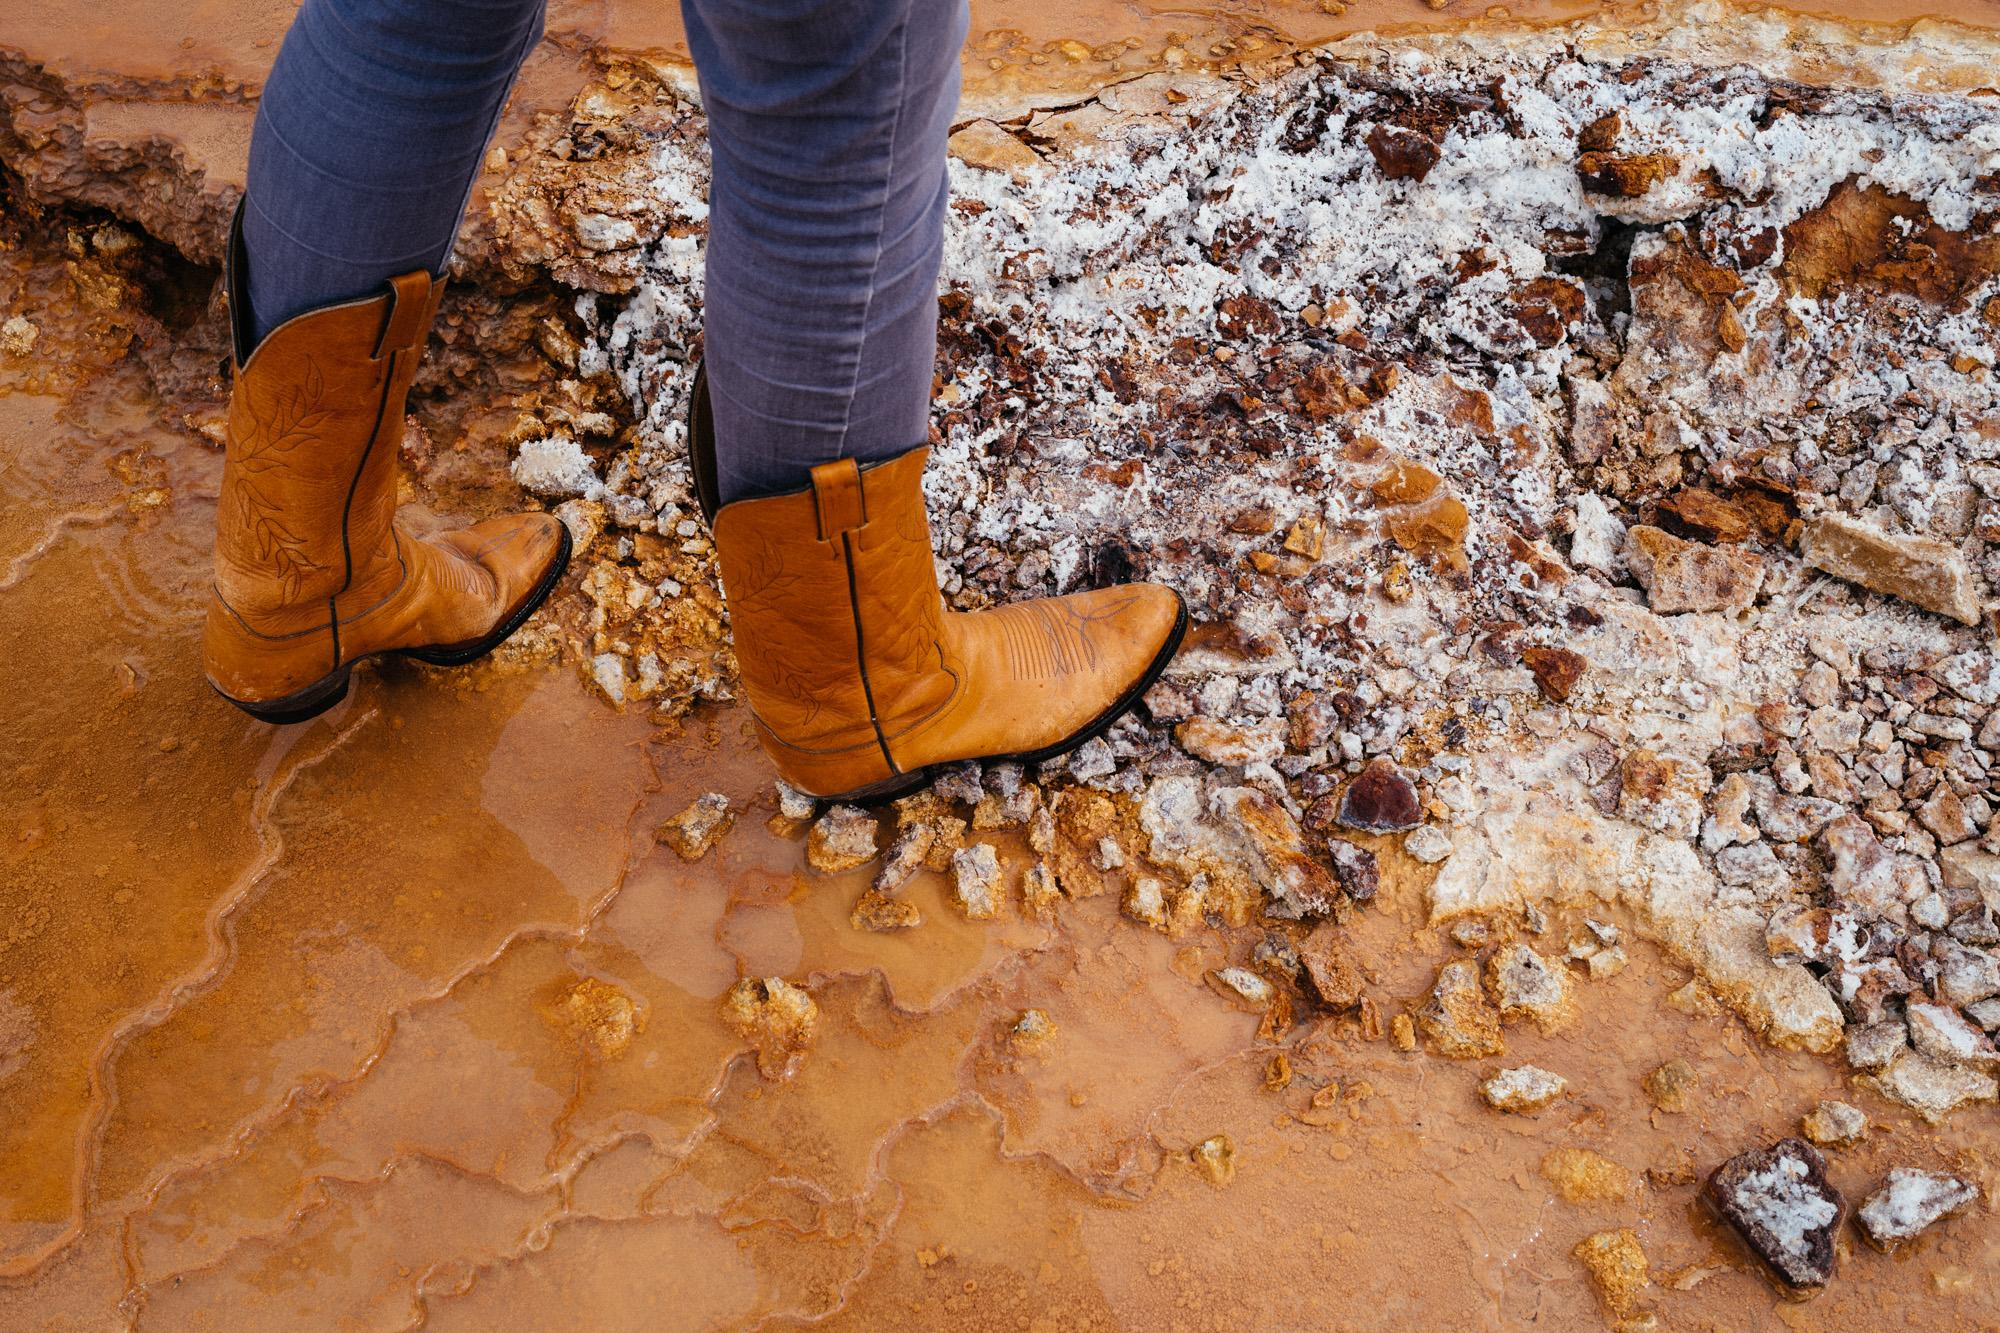 Kirstin's boots.